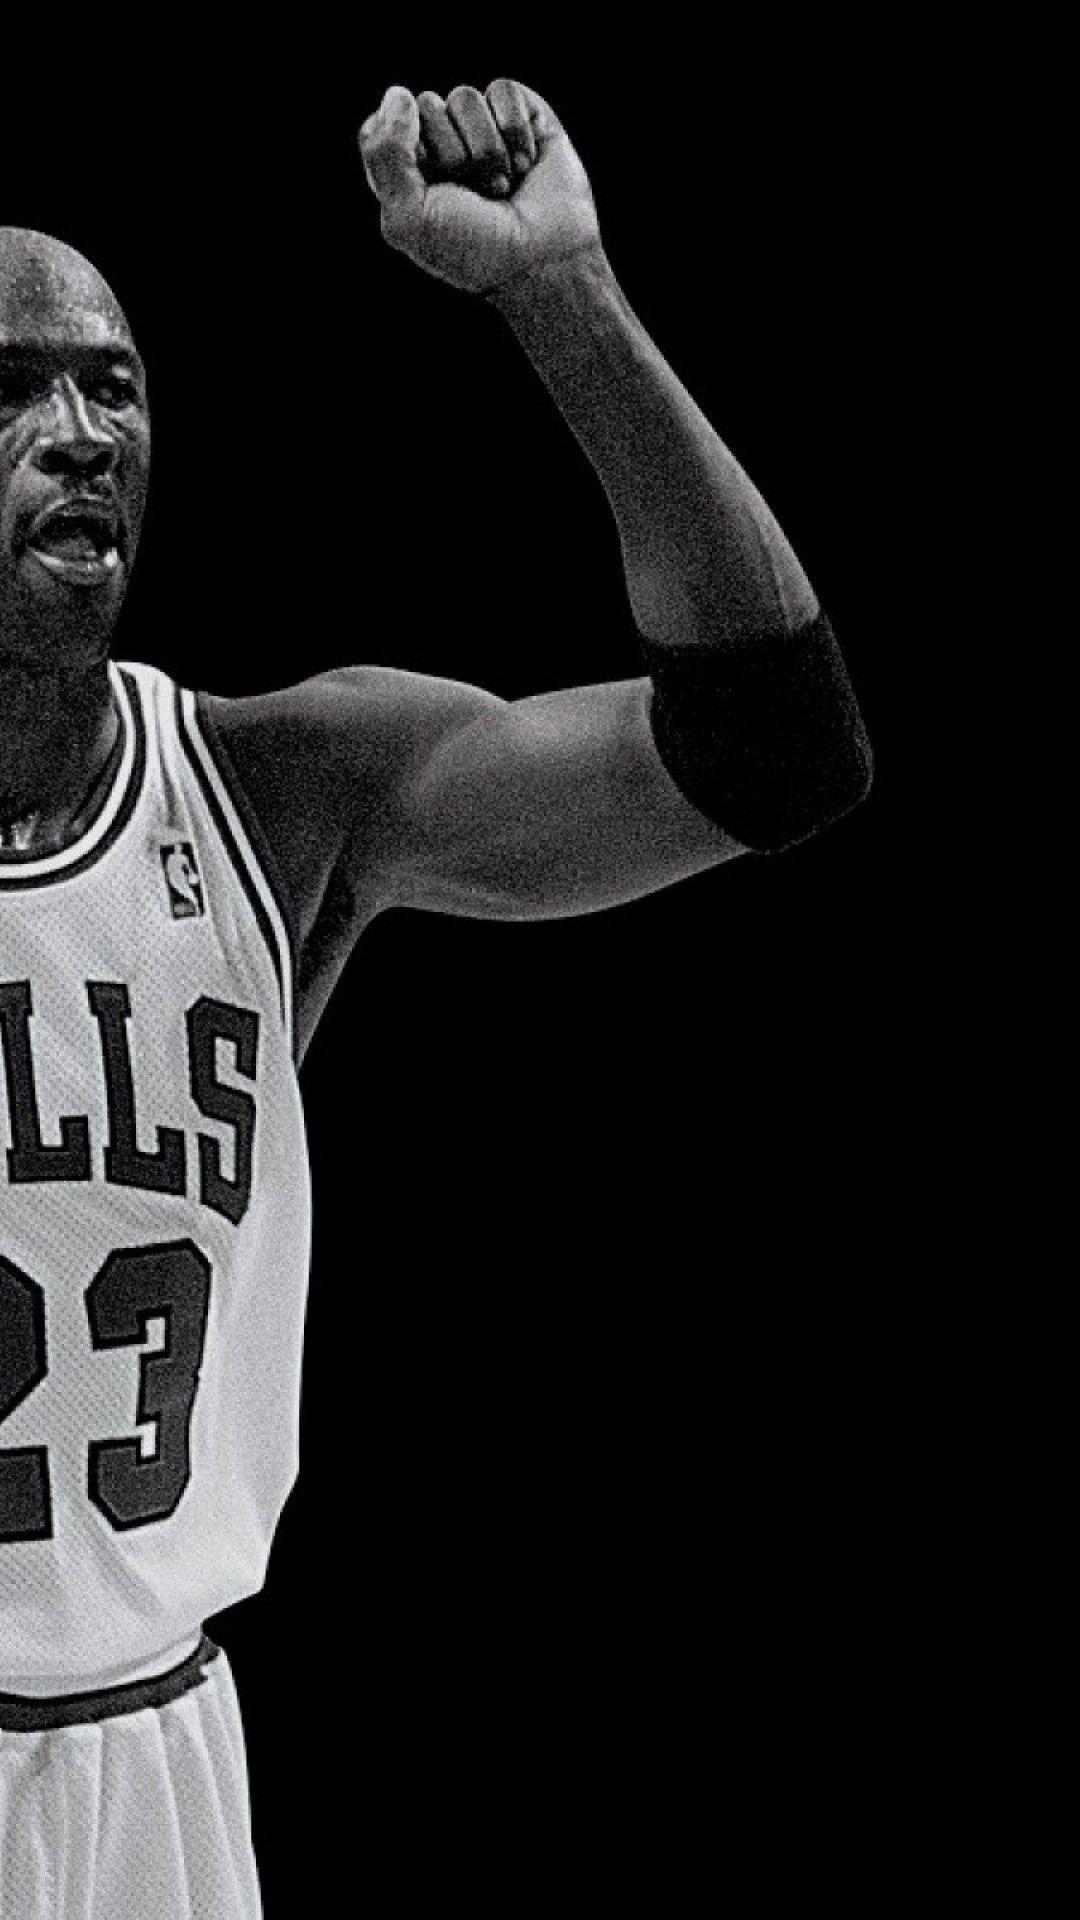 Best Of Michael Jordan Quotes Wallpaper For Iphone Pictures In 2020 Michael Jordan Quotes Jordan Quotes Michael Jordan Pictures